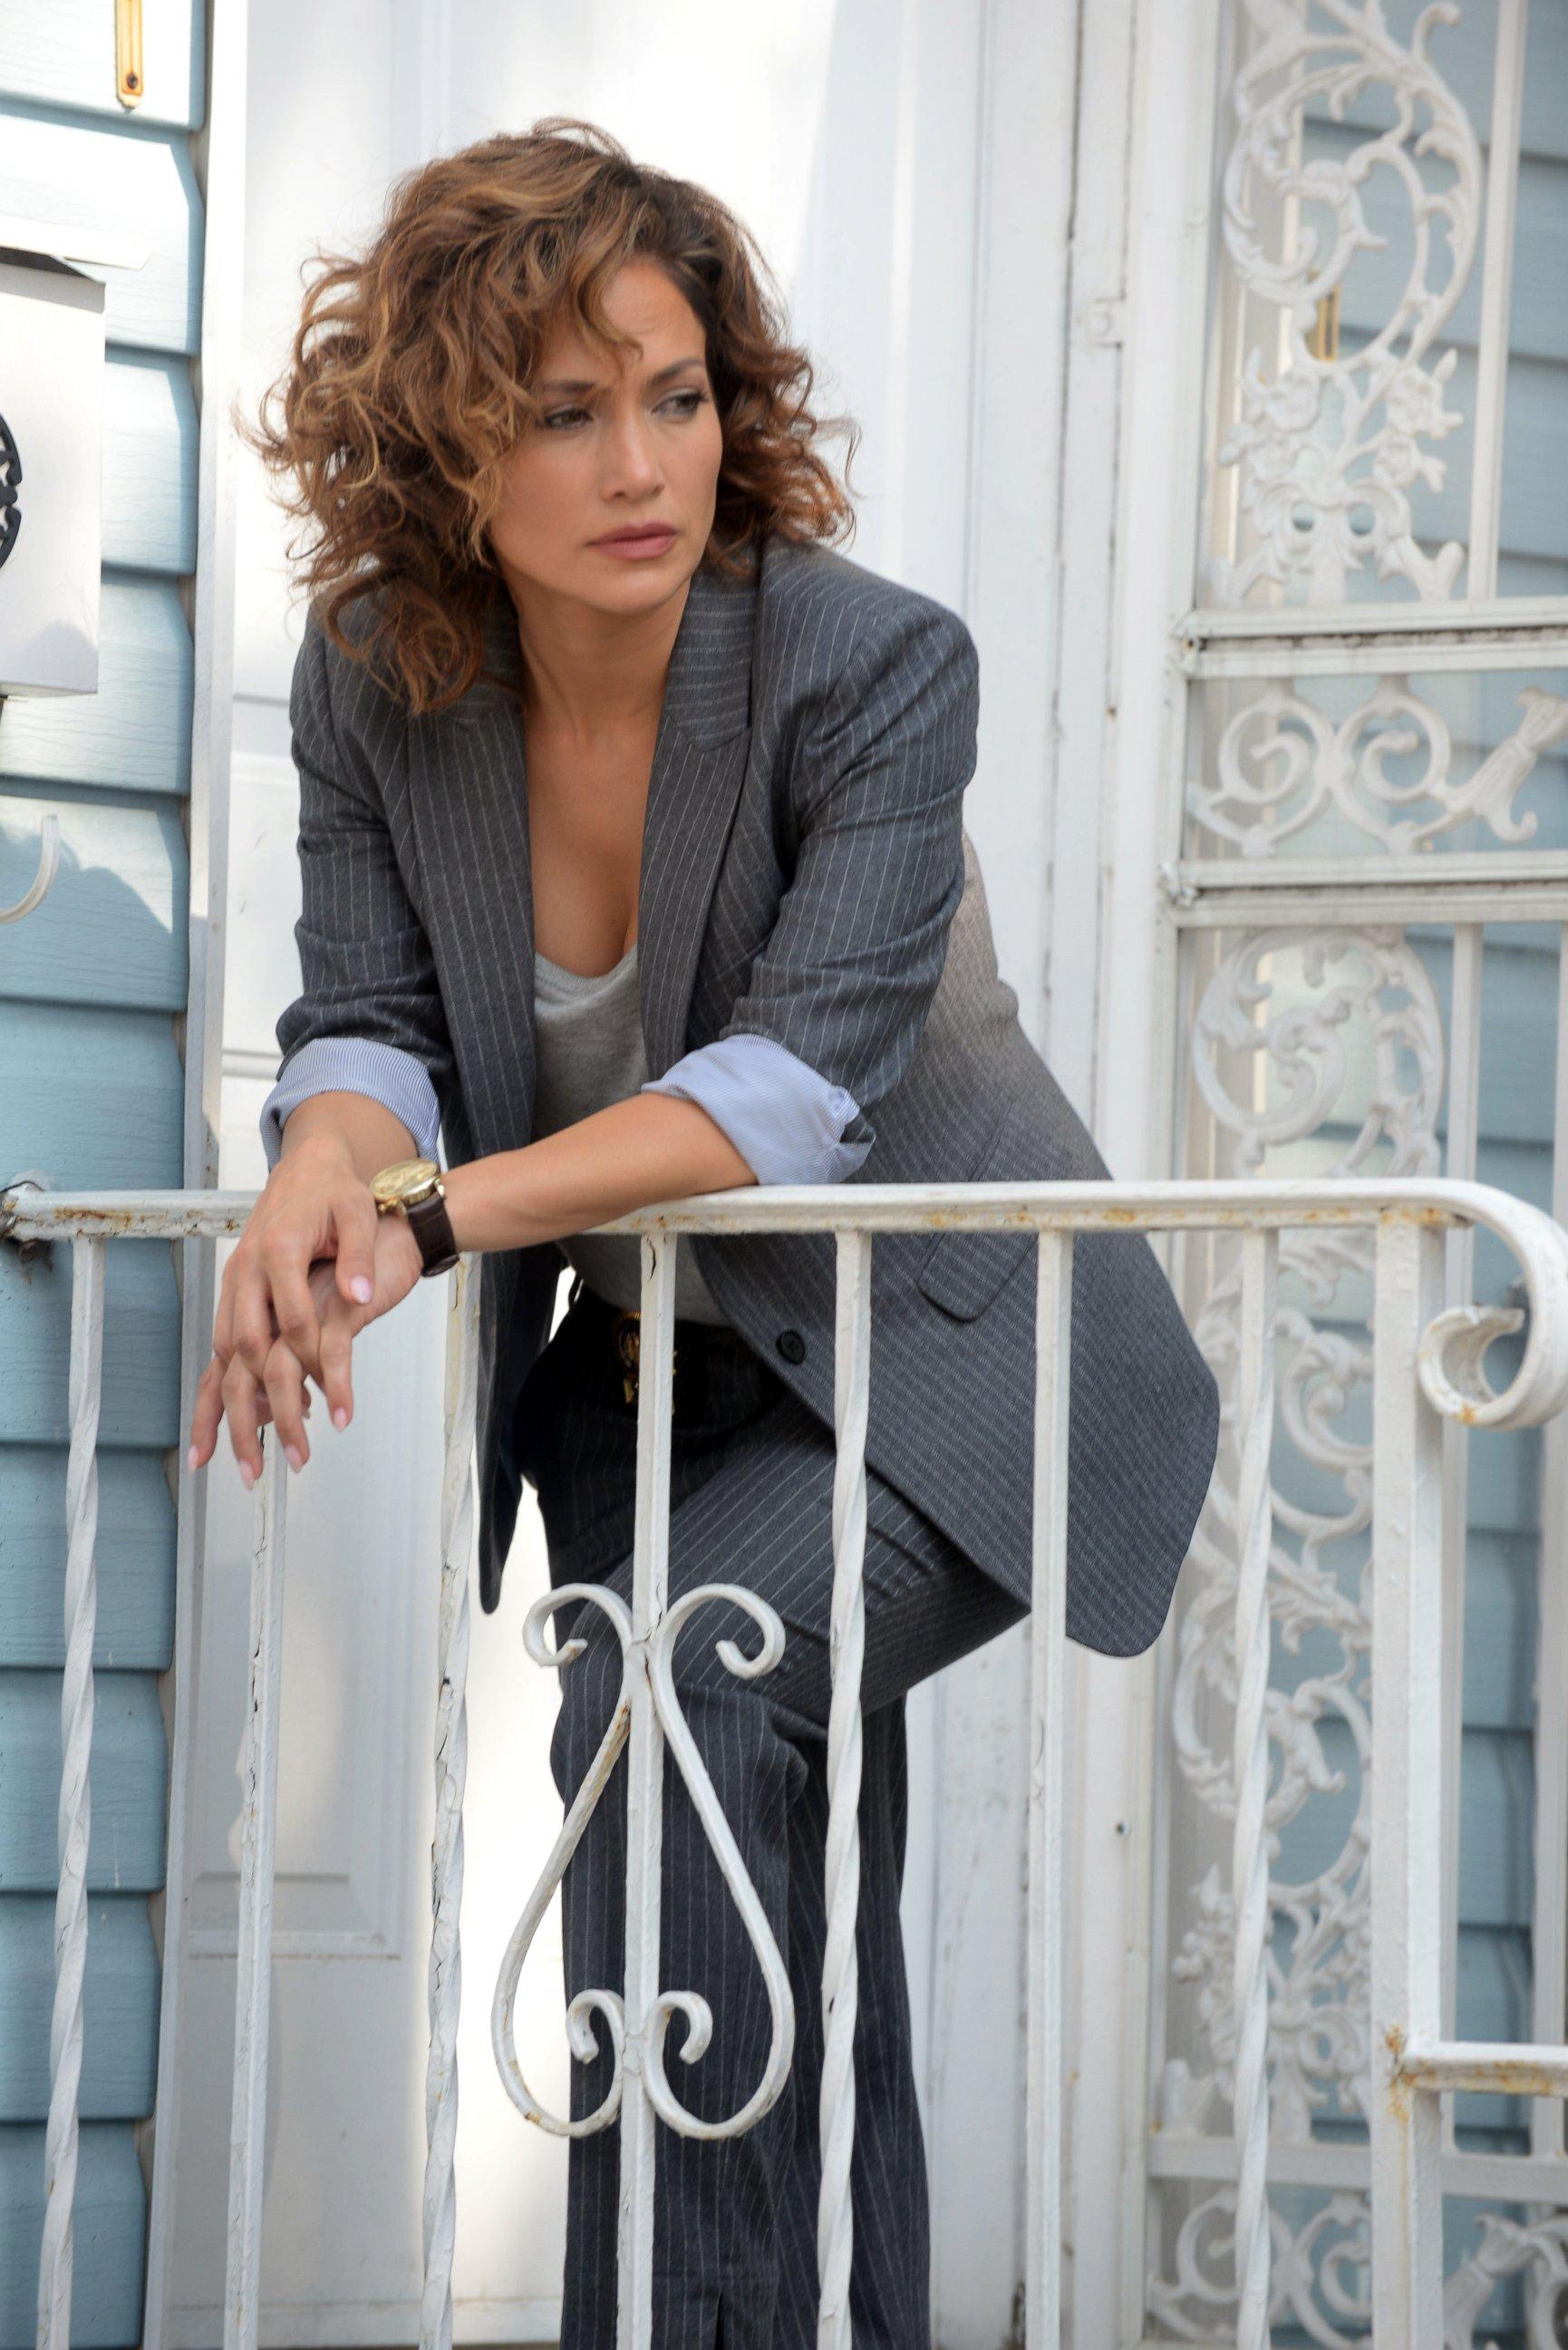 Jennifer Lopez Shoots Scenes as an Undercover Cop